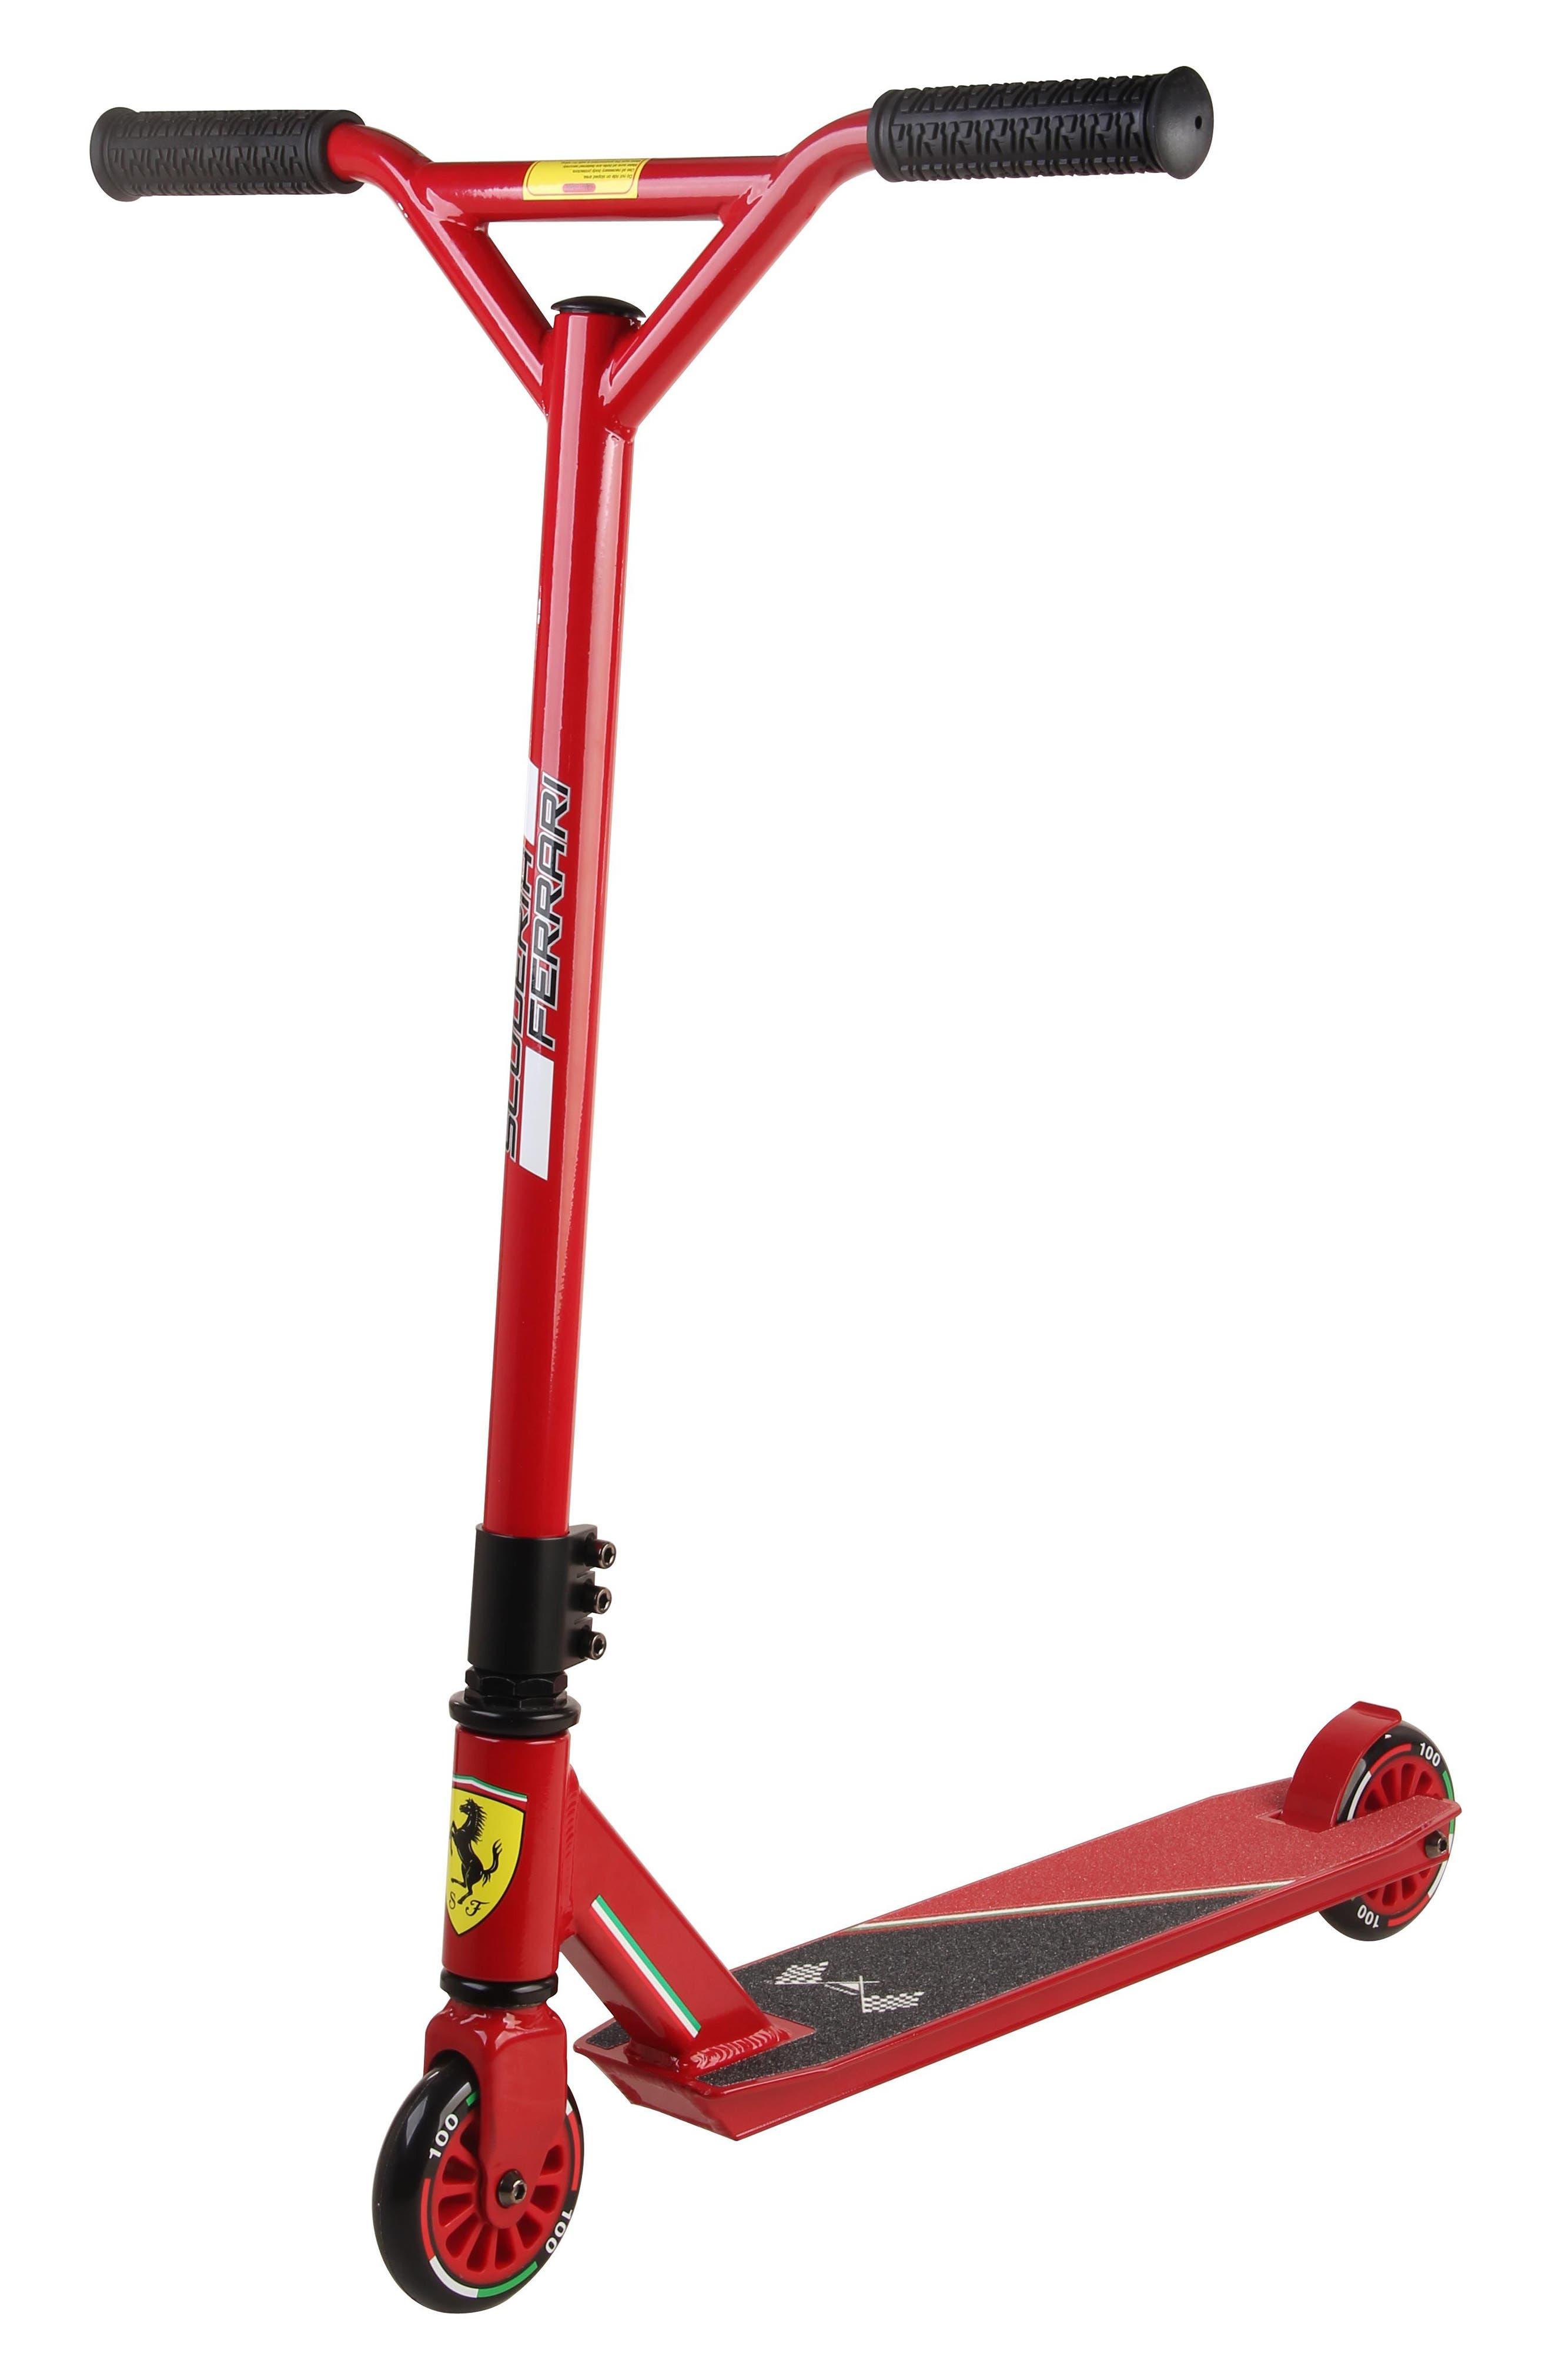 Ferrari Stunt Scooter